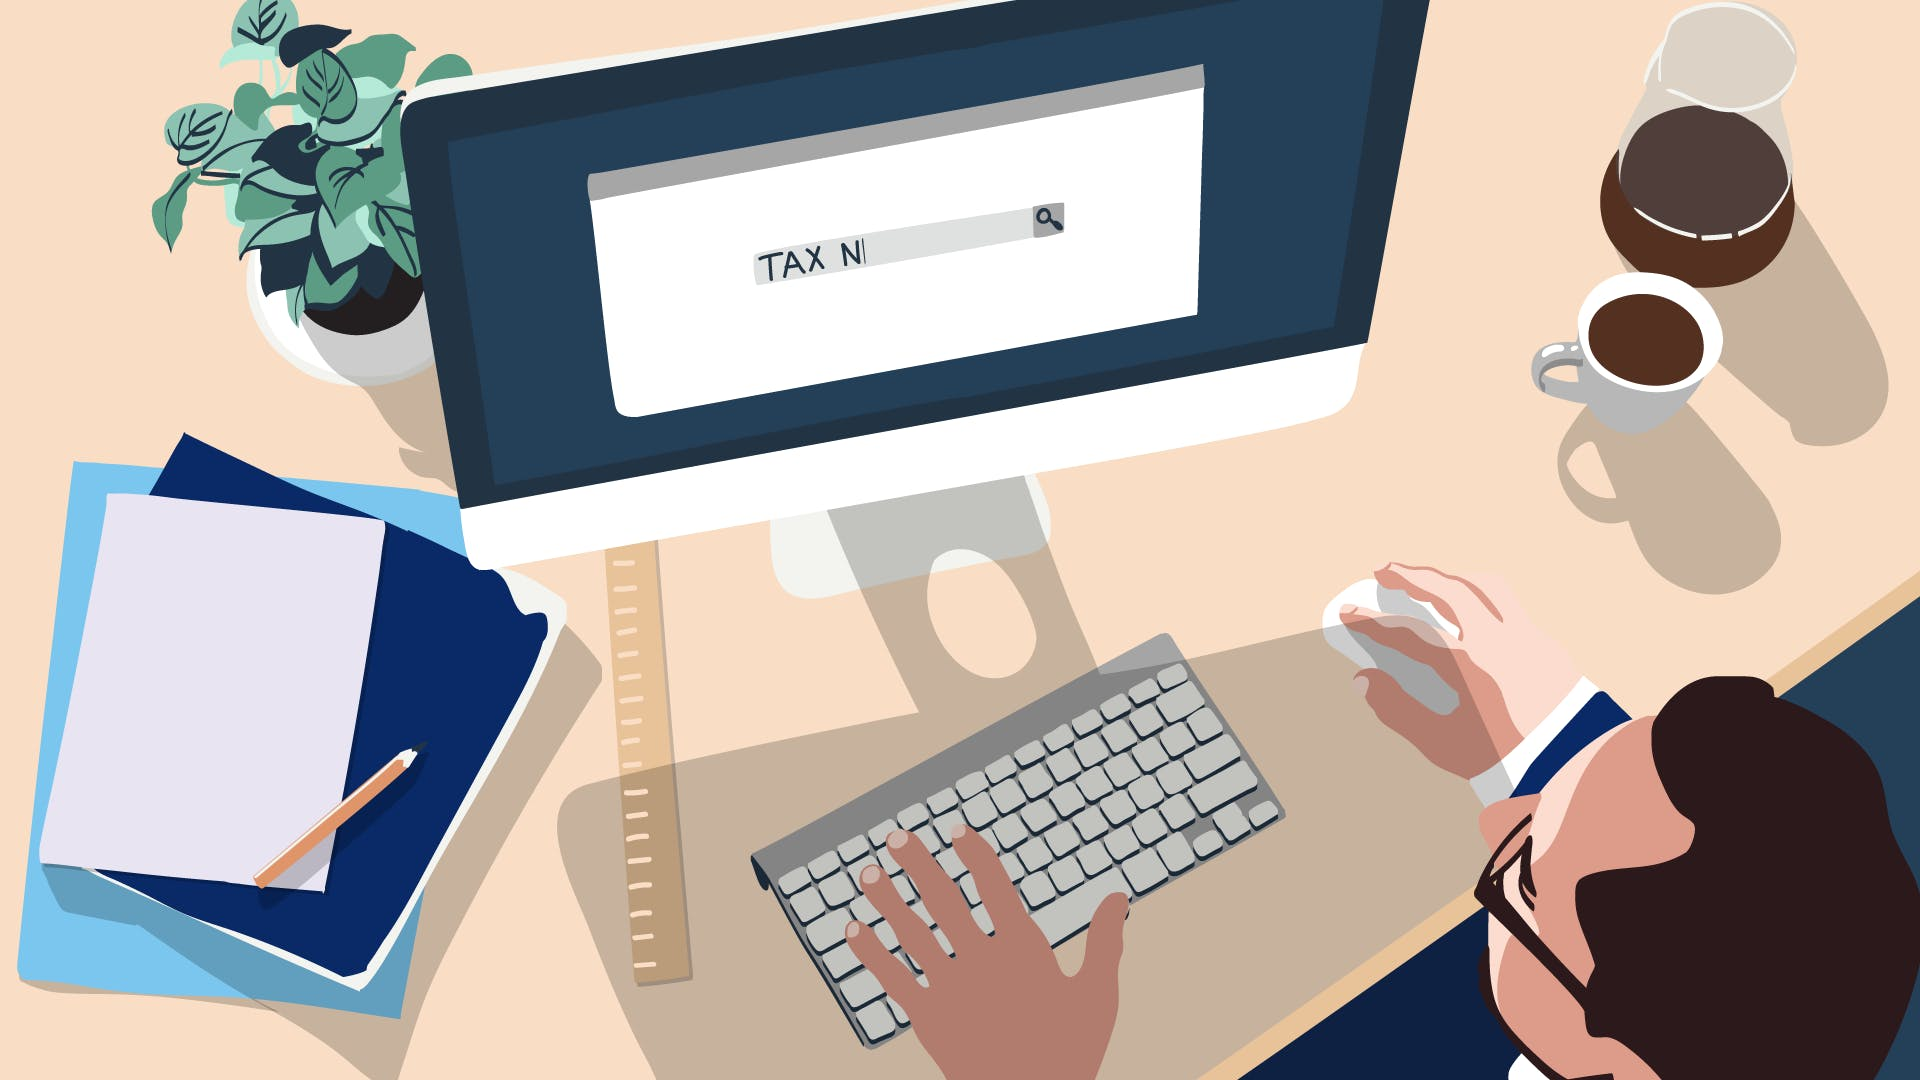 Geschäftsmann am Computer, beantragt die Steuernummer bei der Finanzbehörde.